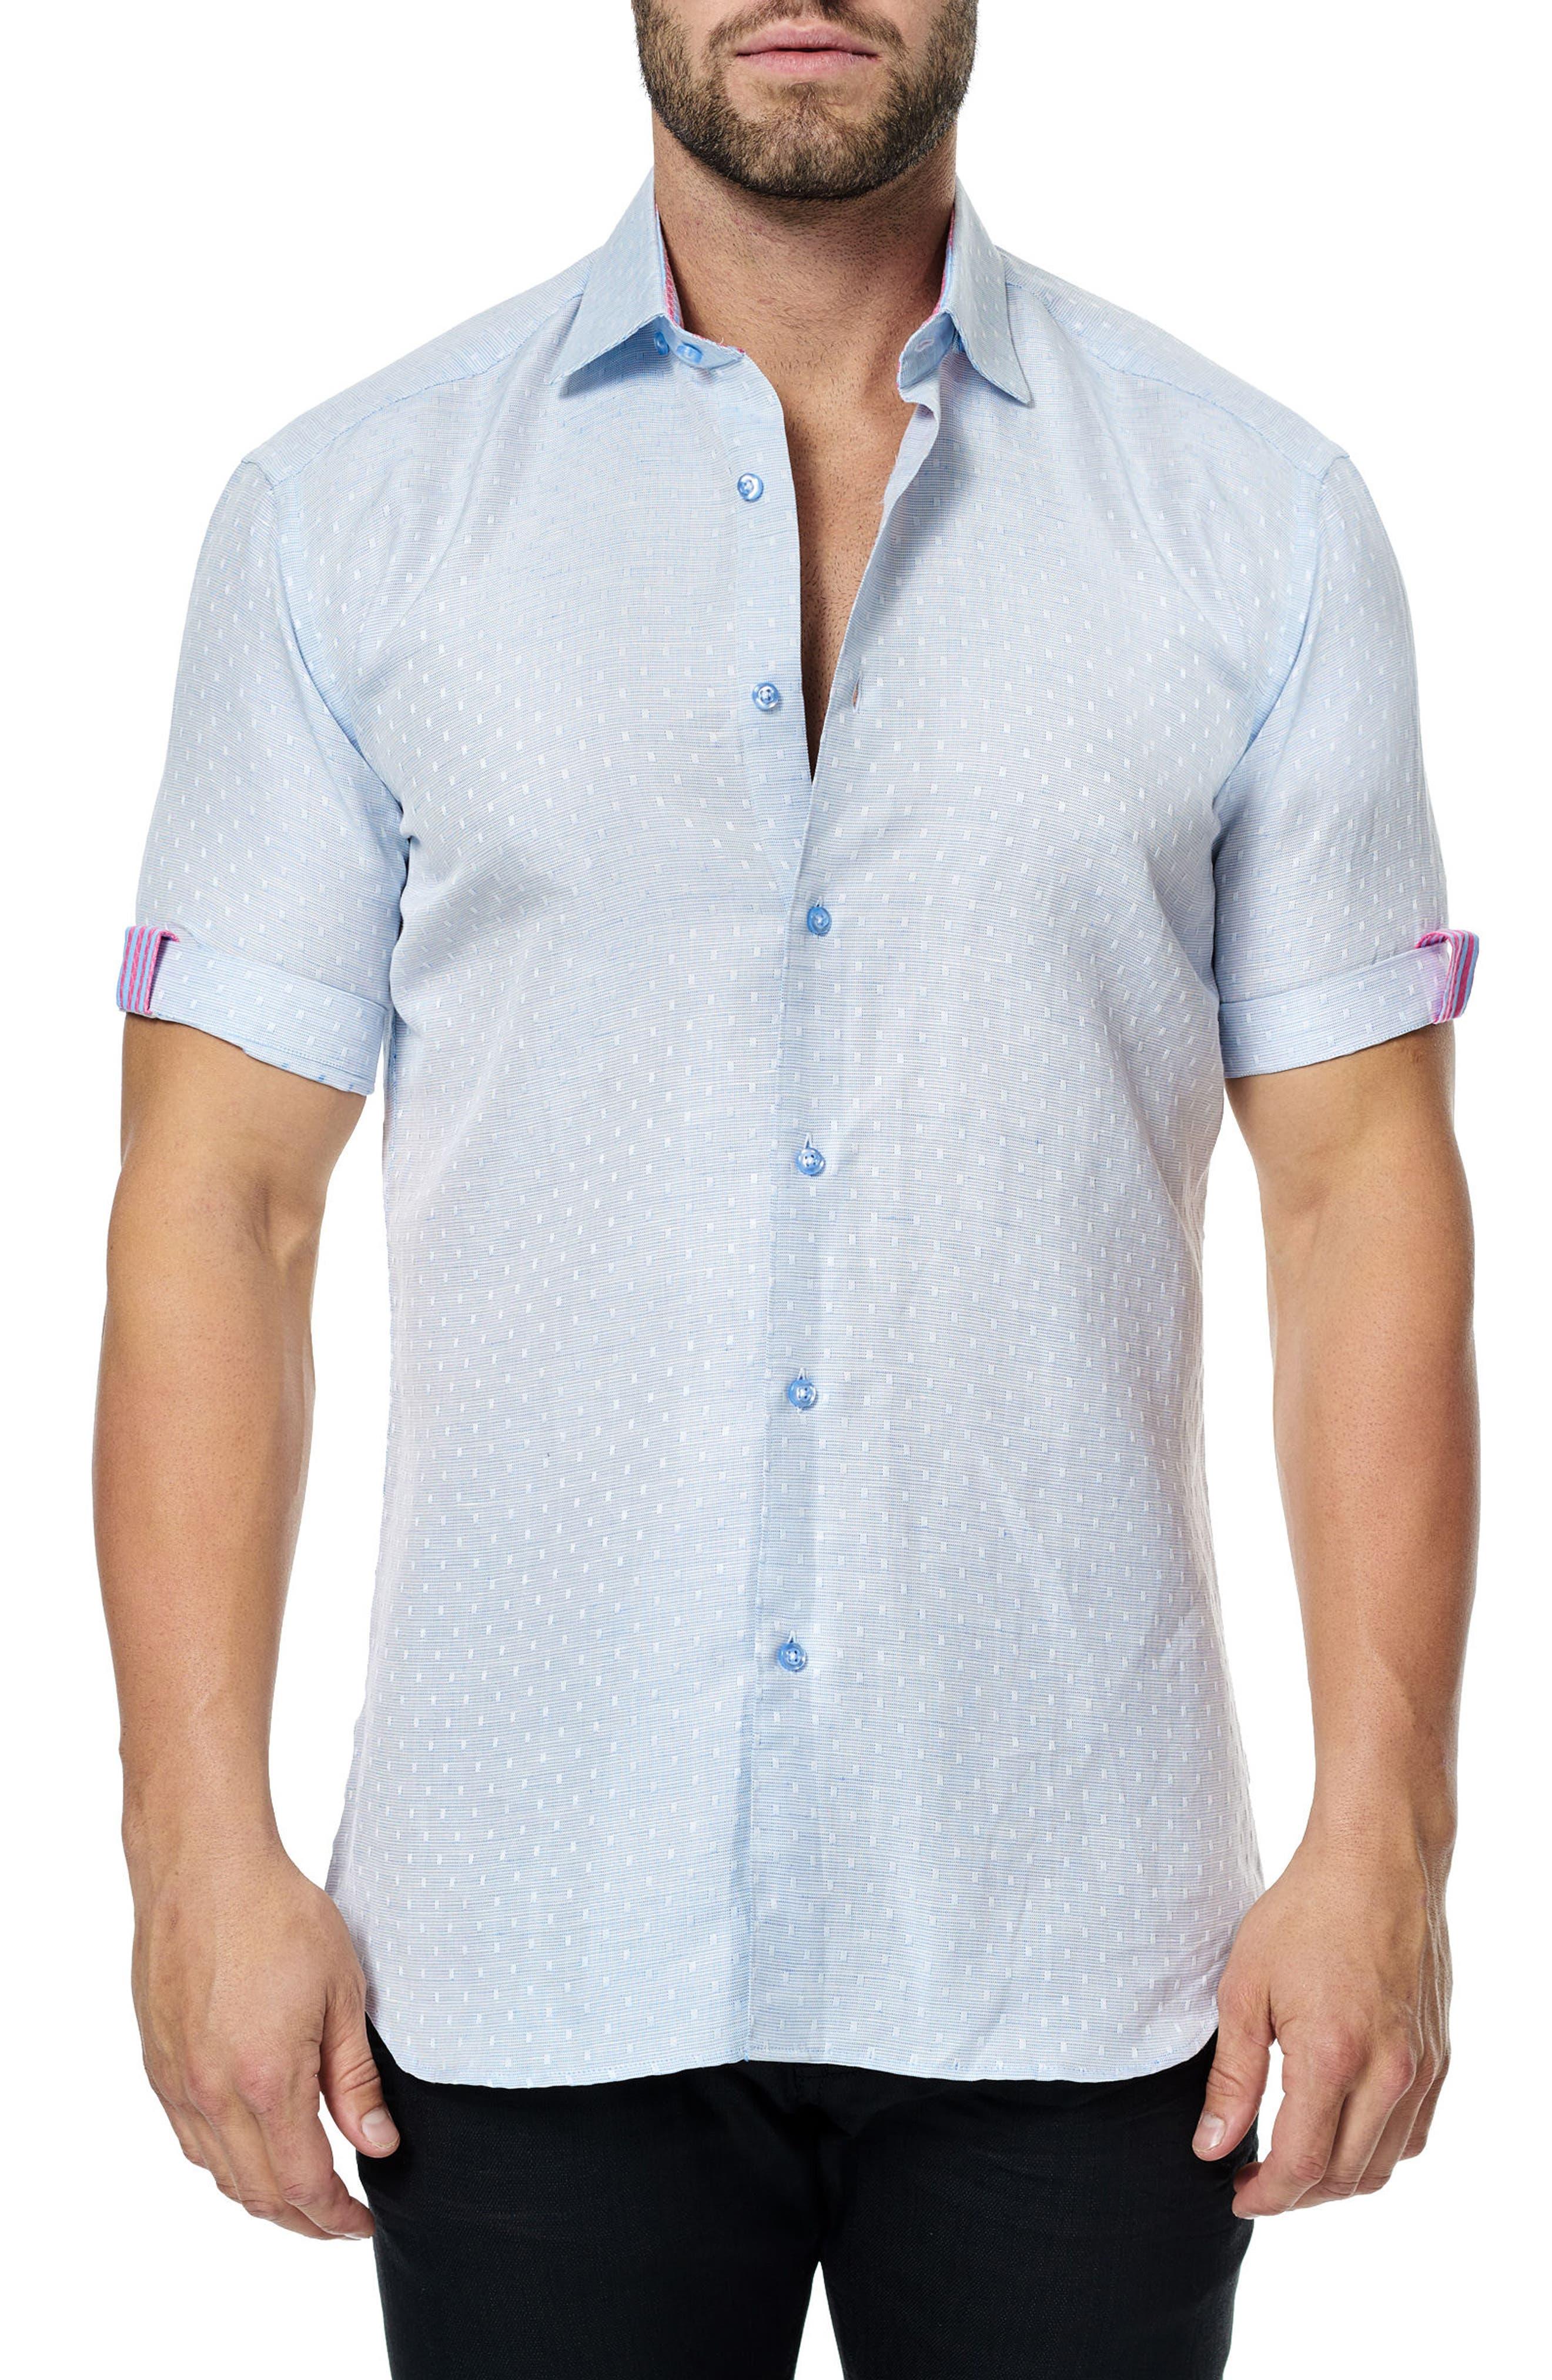 Maceoo Fresh Jacquard Sport Shirt